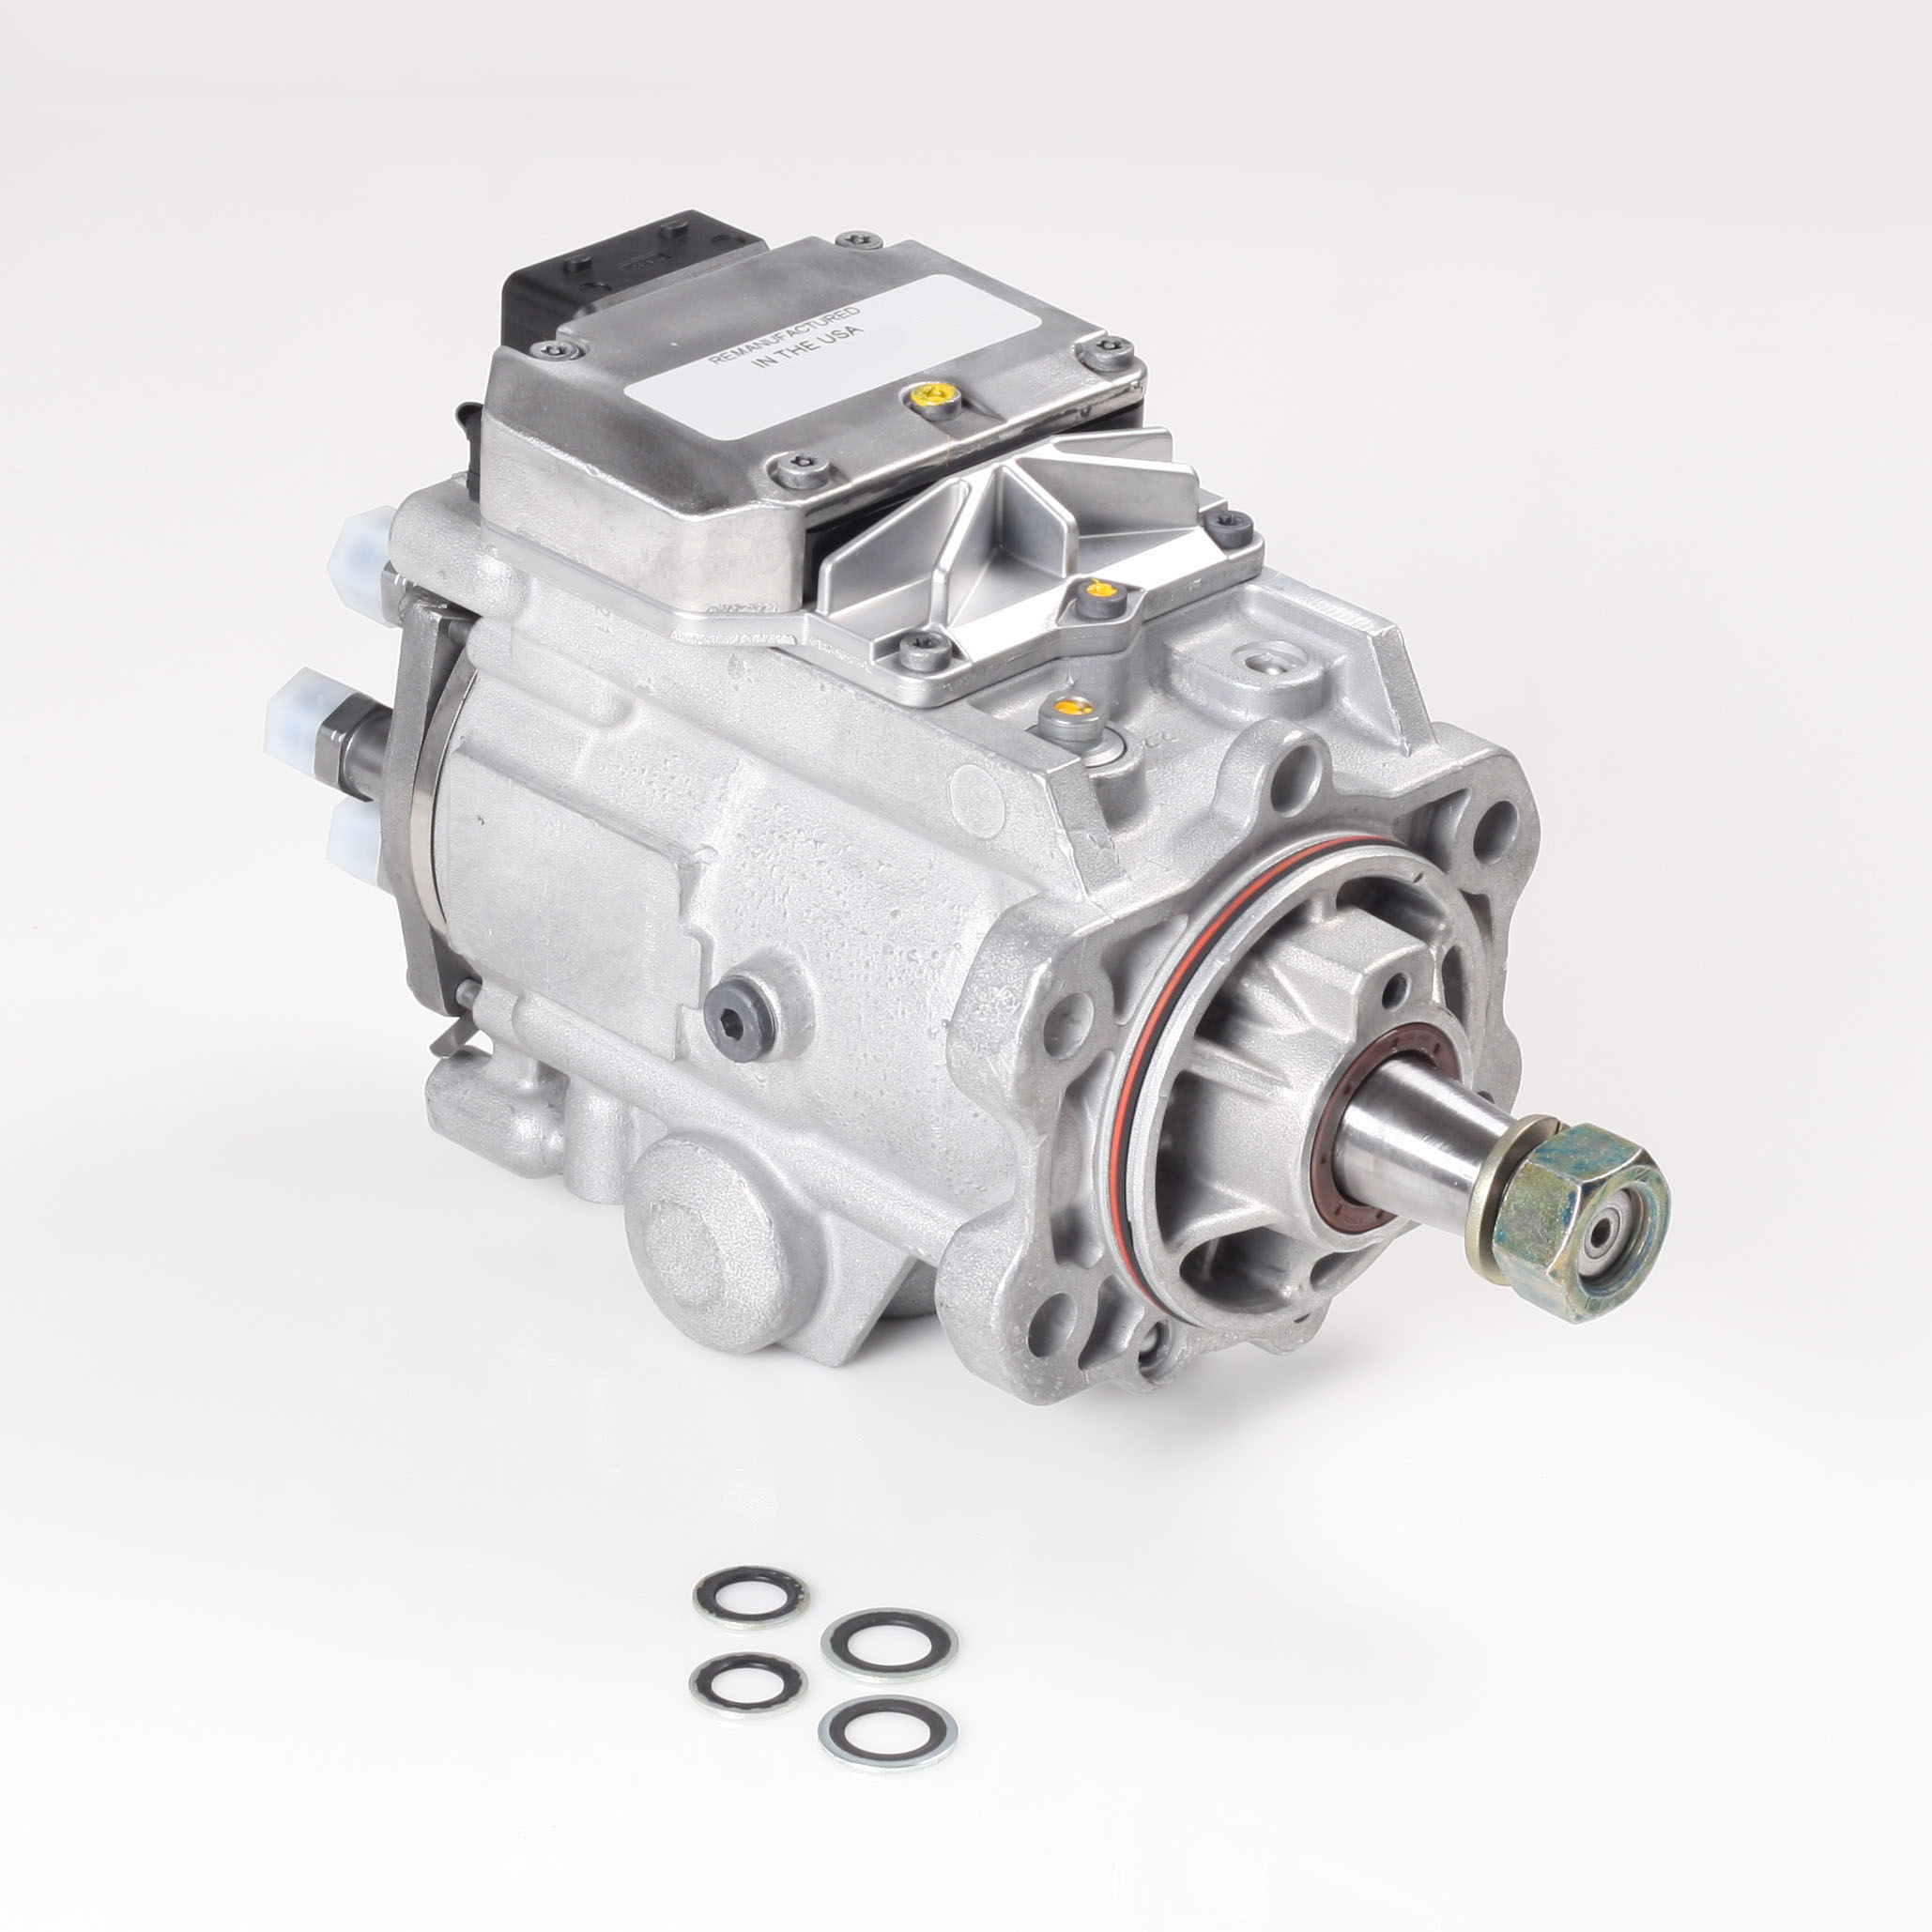 Vp Dodge Cummins on Duramax Diesel Oil Pump